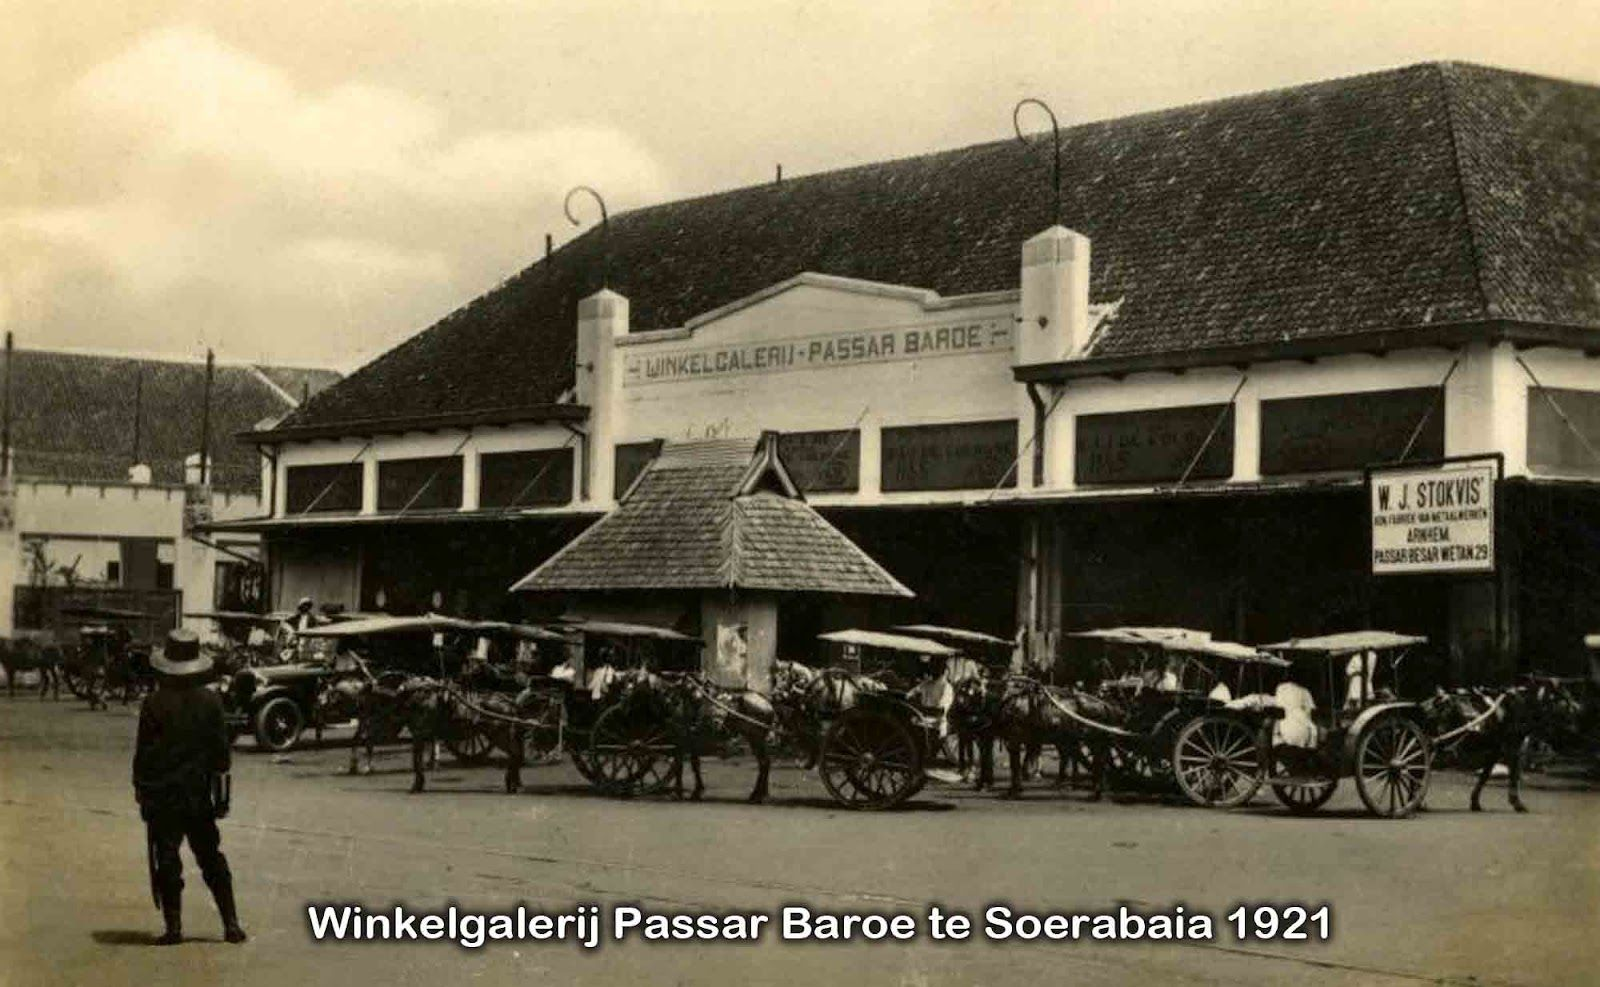 Passaer baroe (sekarang Bappeprov Jatim Jl. Pahlawan